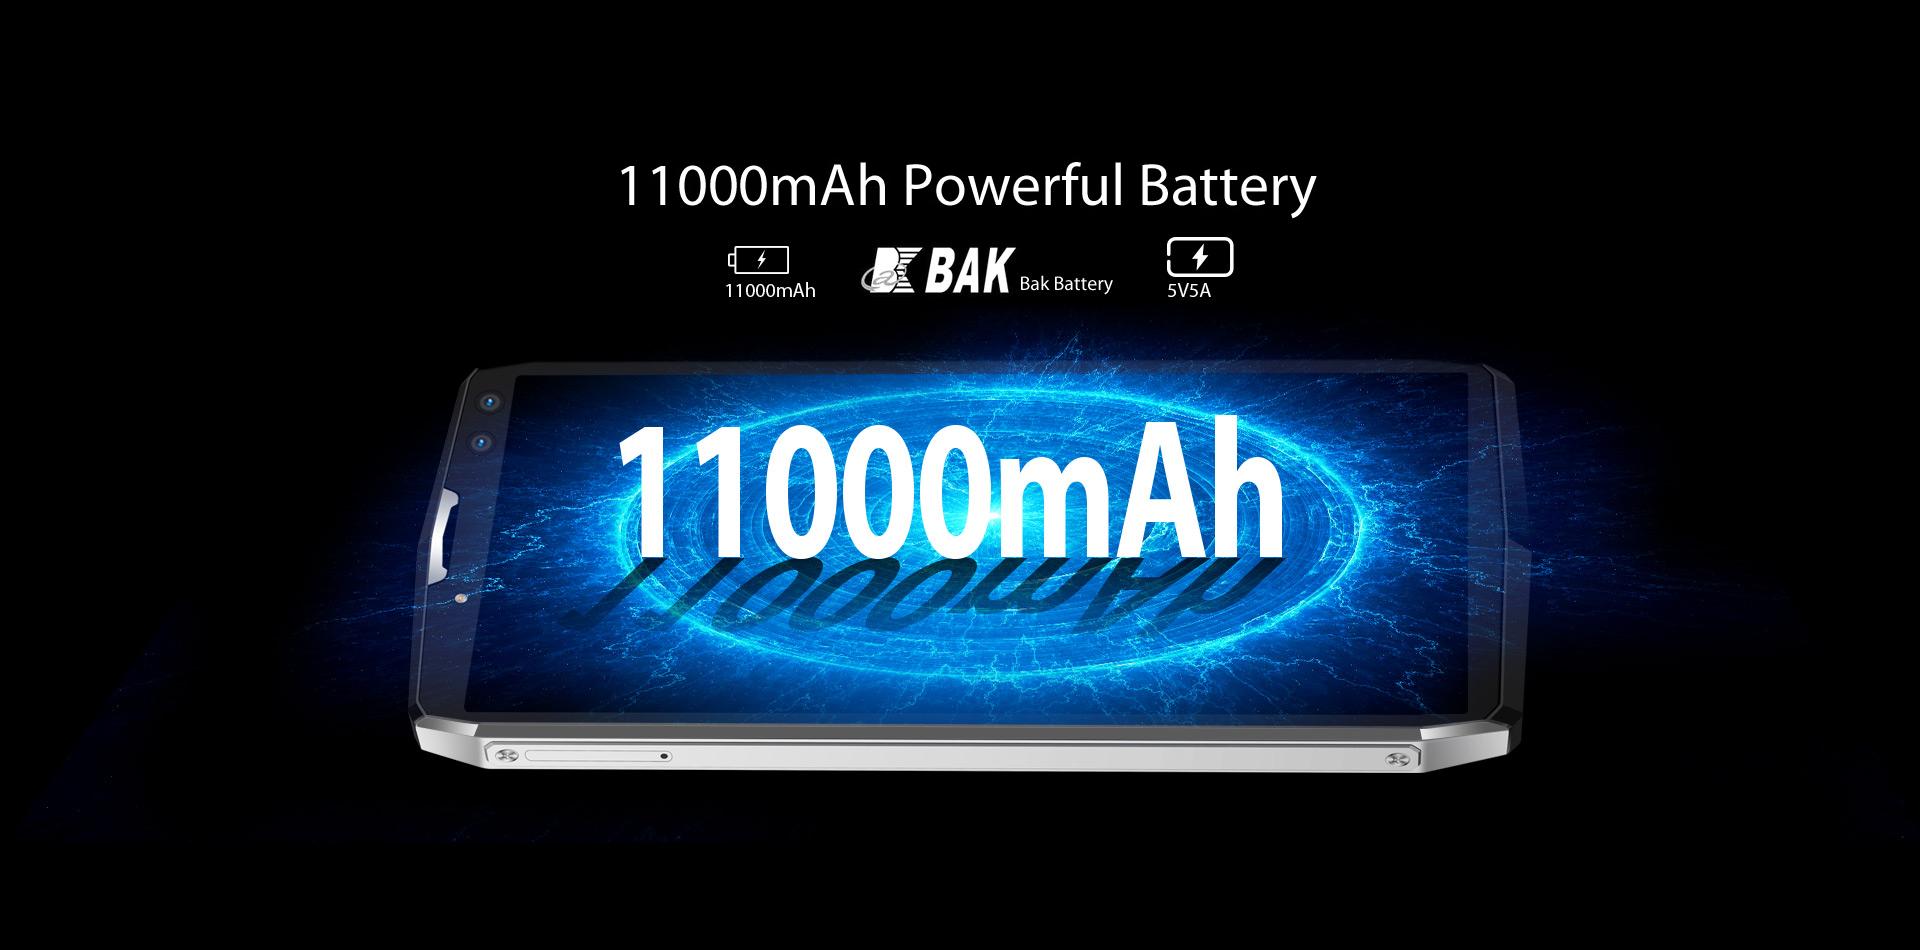 Blackview P10000 Pro: Prueba de duración de batería